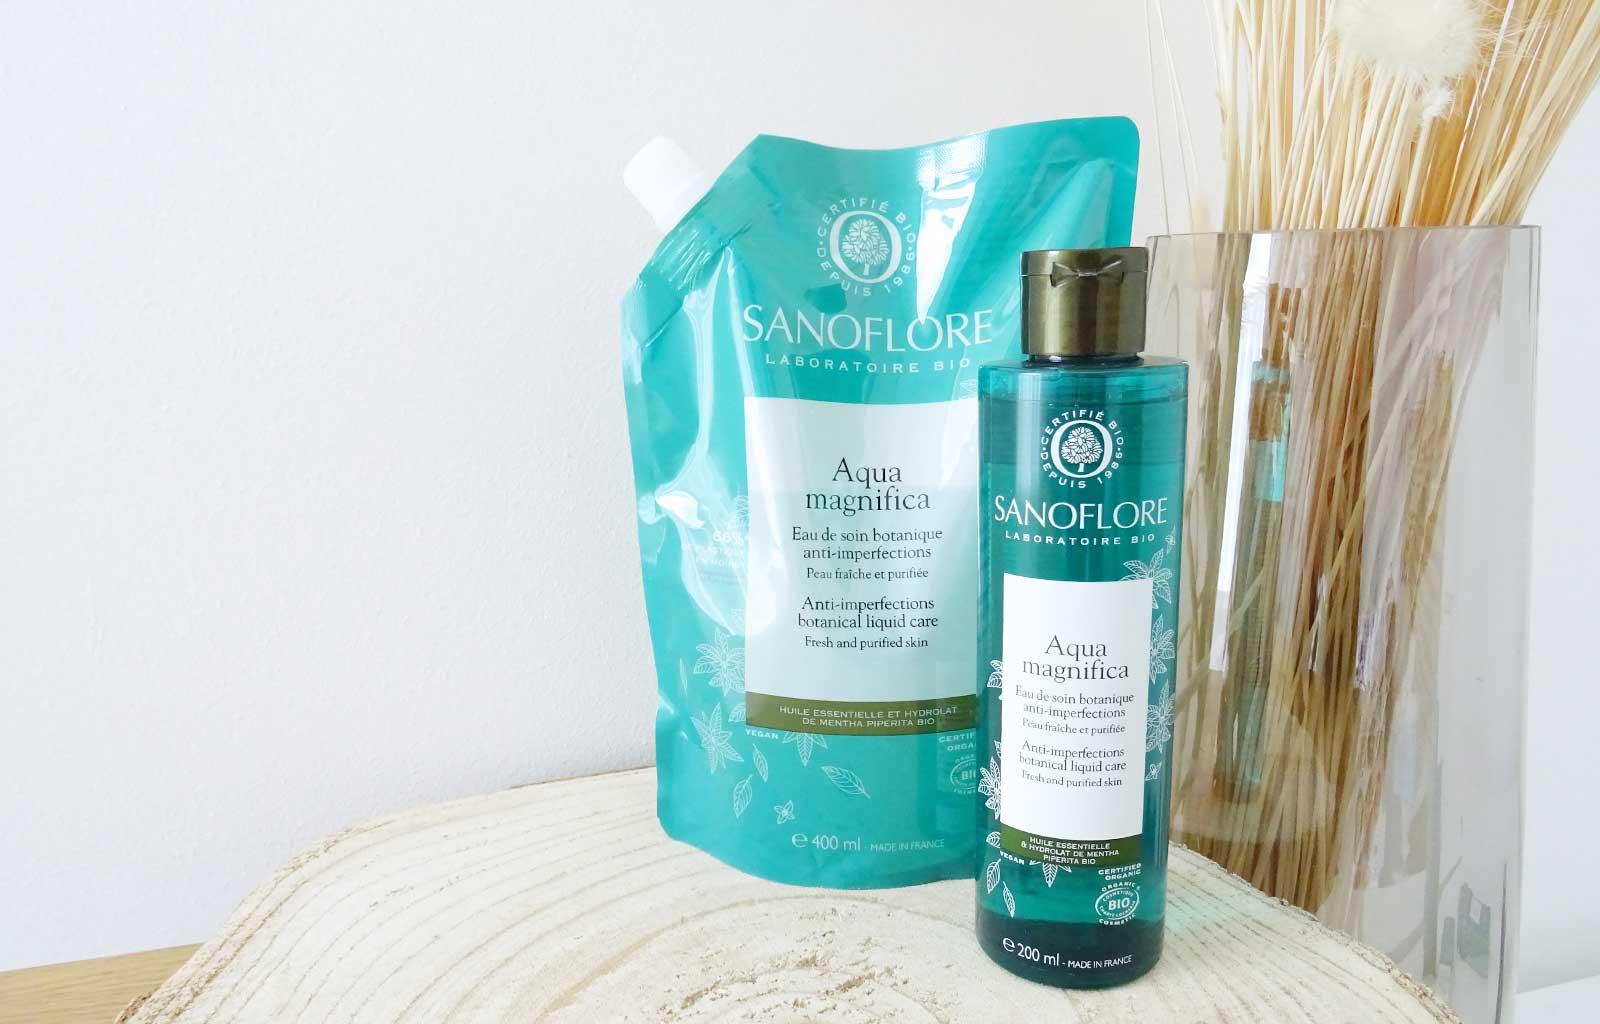 soins anti-imperfection Magnifica Sanoflore aqua magnifica lotion